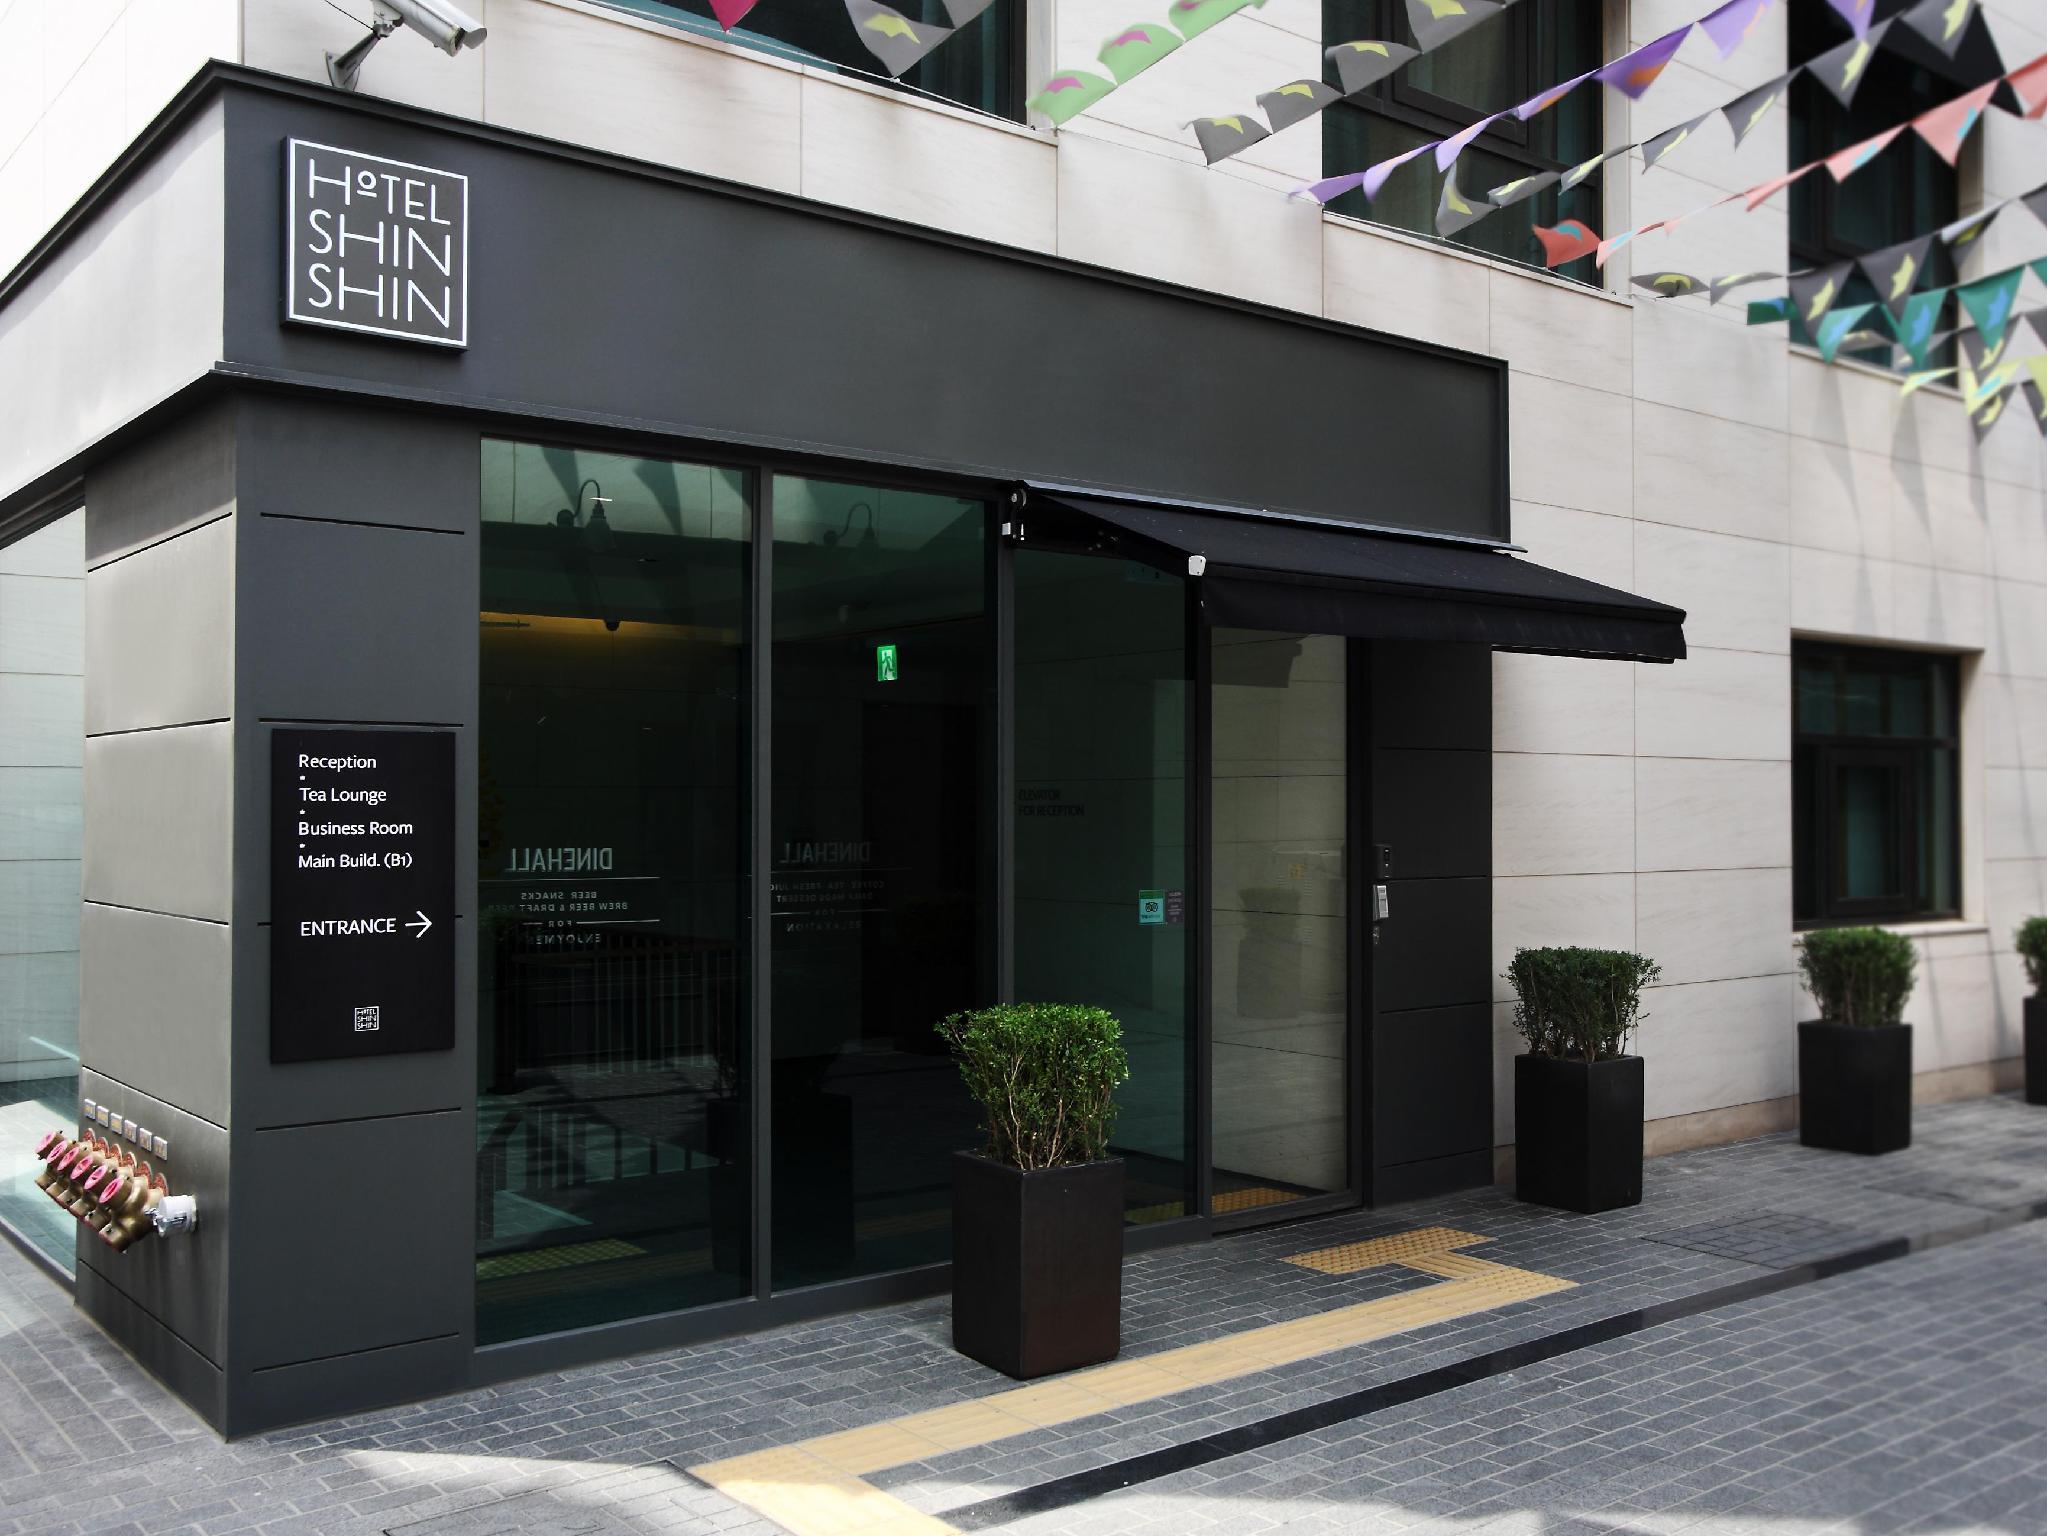 Shinshin Hotel Myeongdong Seoul